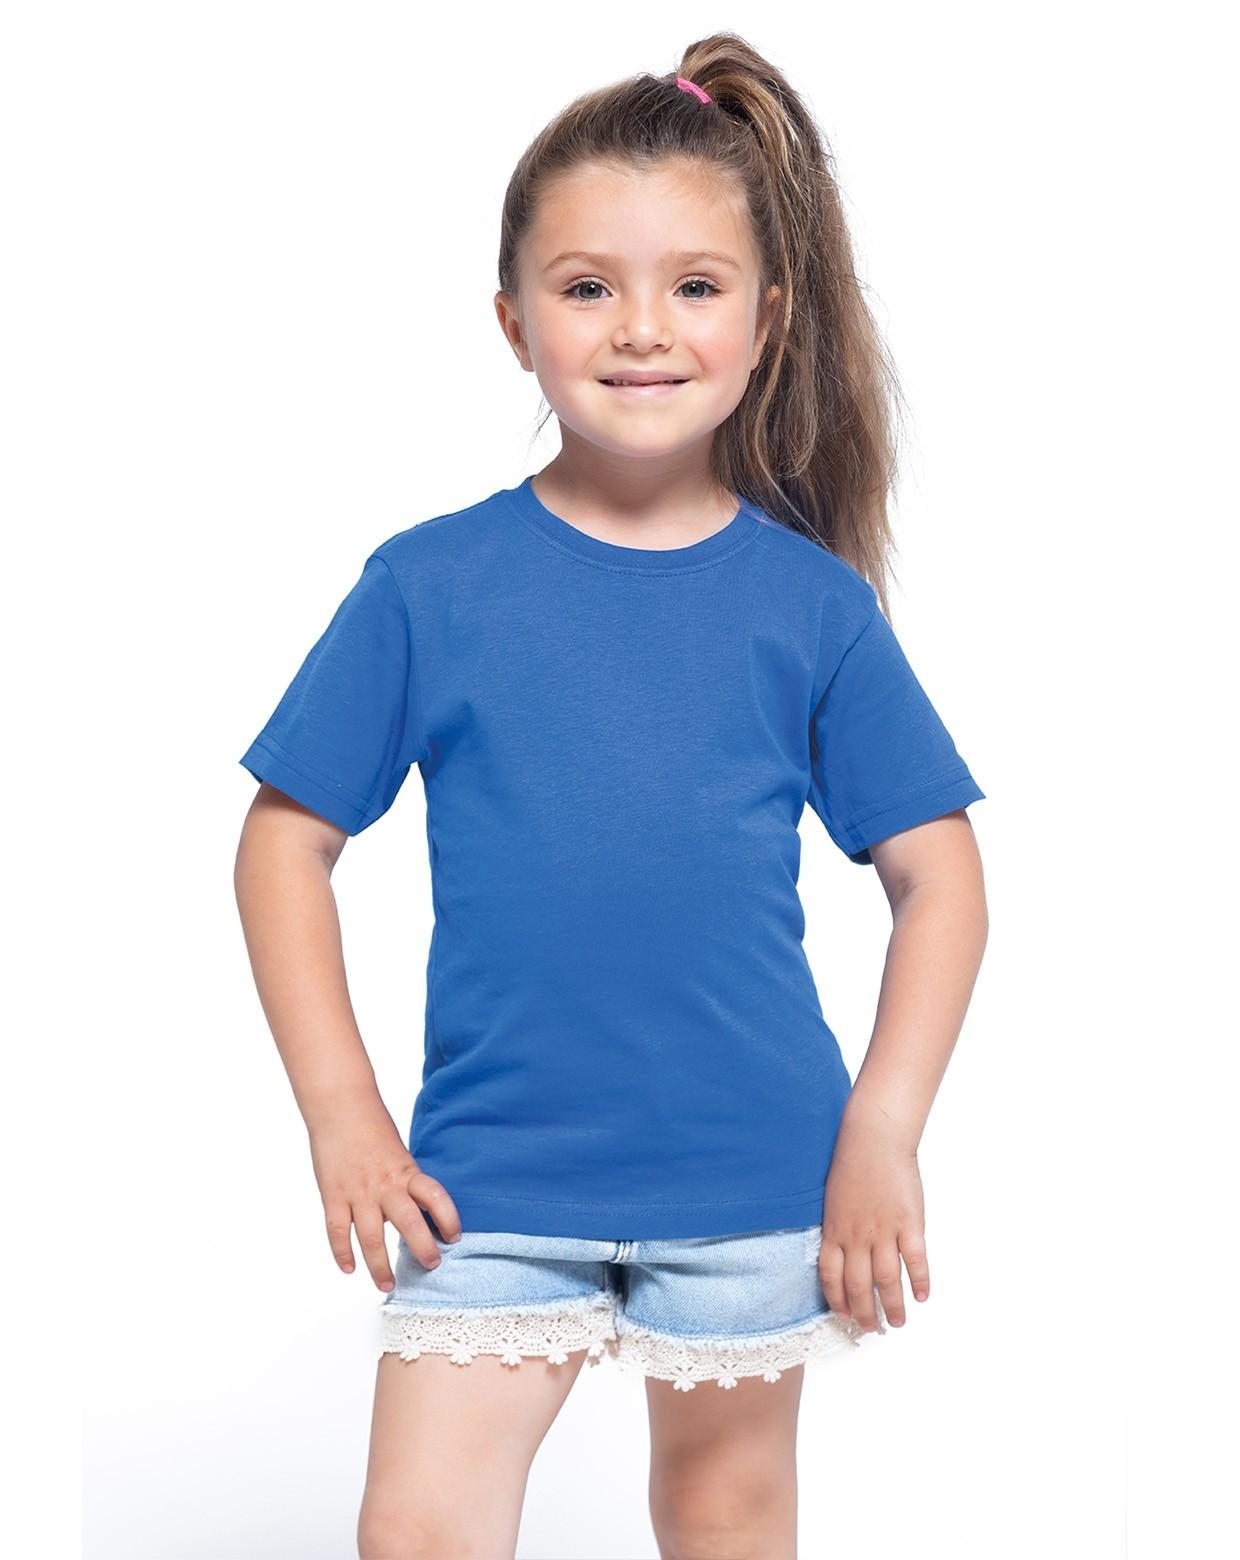 JHK PREMIUM KID T-SHIRT